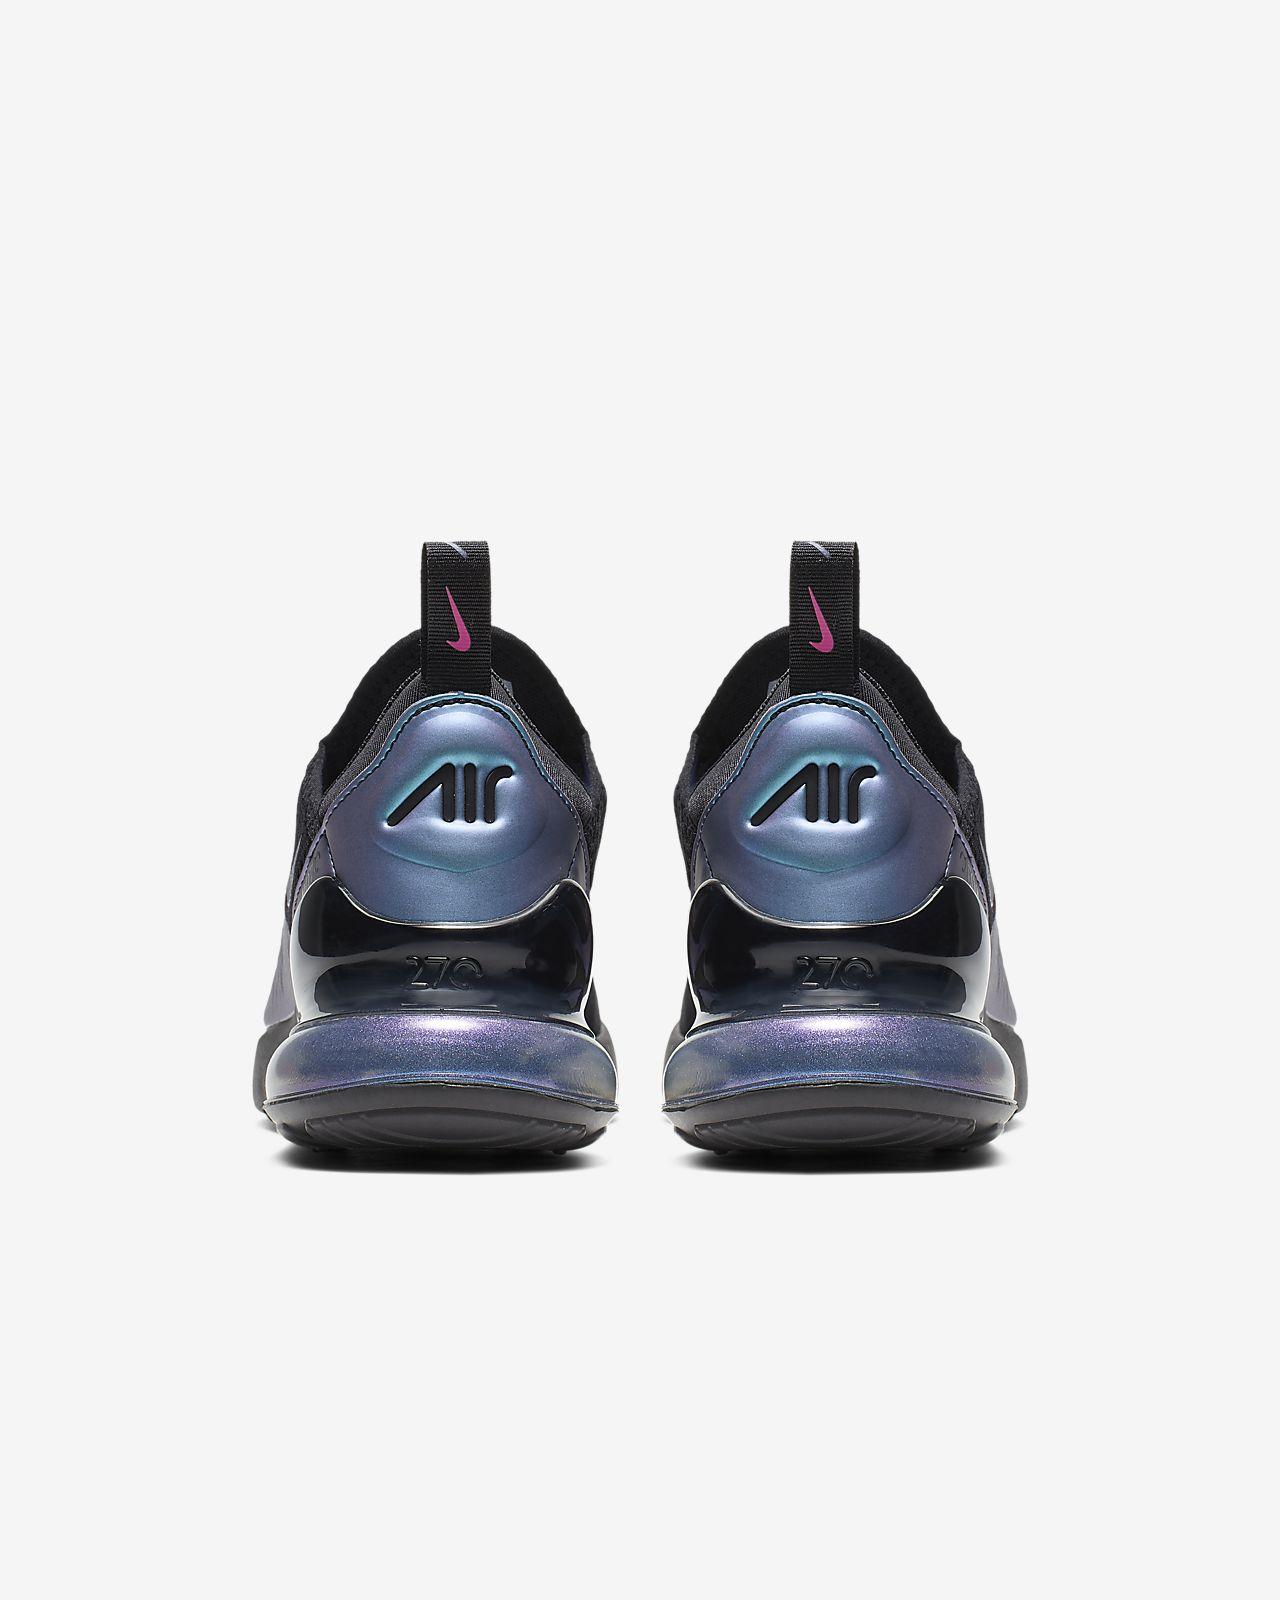 online store ea7bf 1a10f ... Nike Air Max 270 Damenschuh